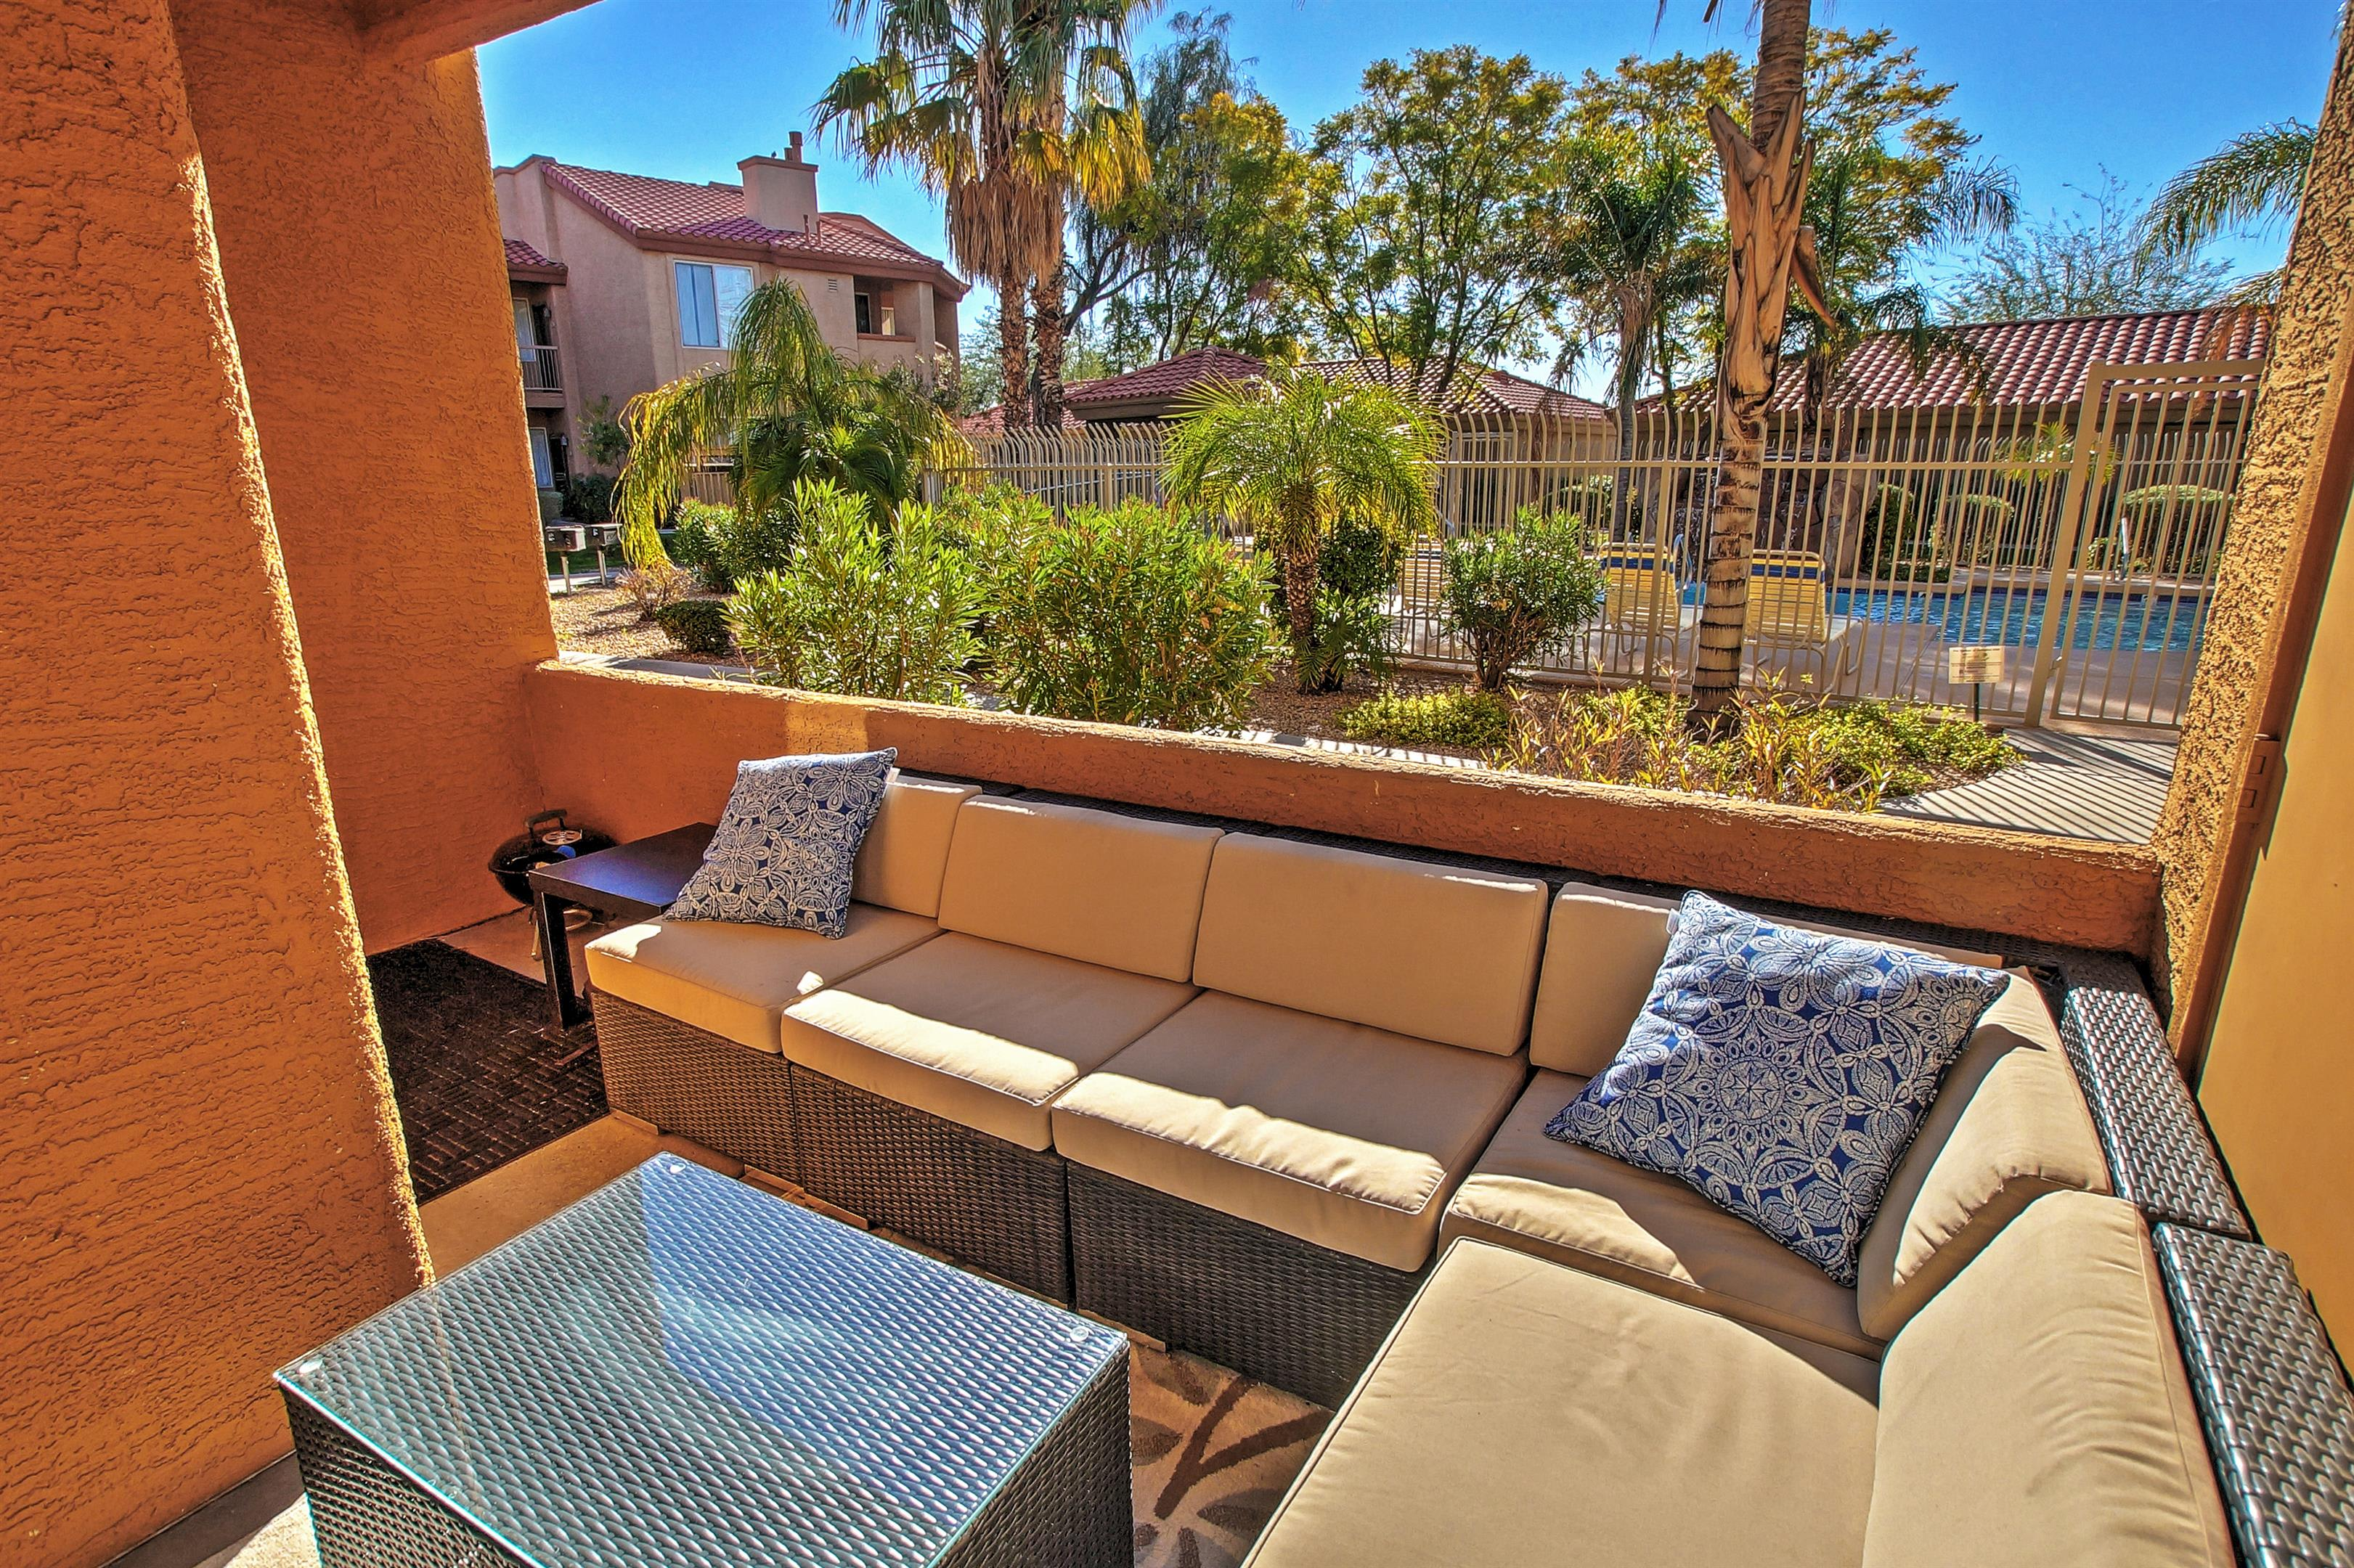 Phoenix Vacation Rental Condo | 2BR | 2BA | 500 Sq Ft | Single Story